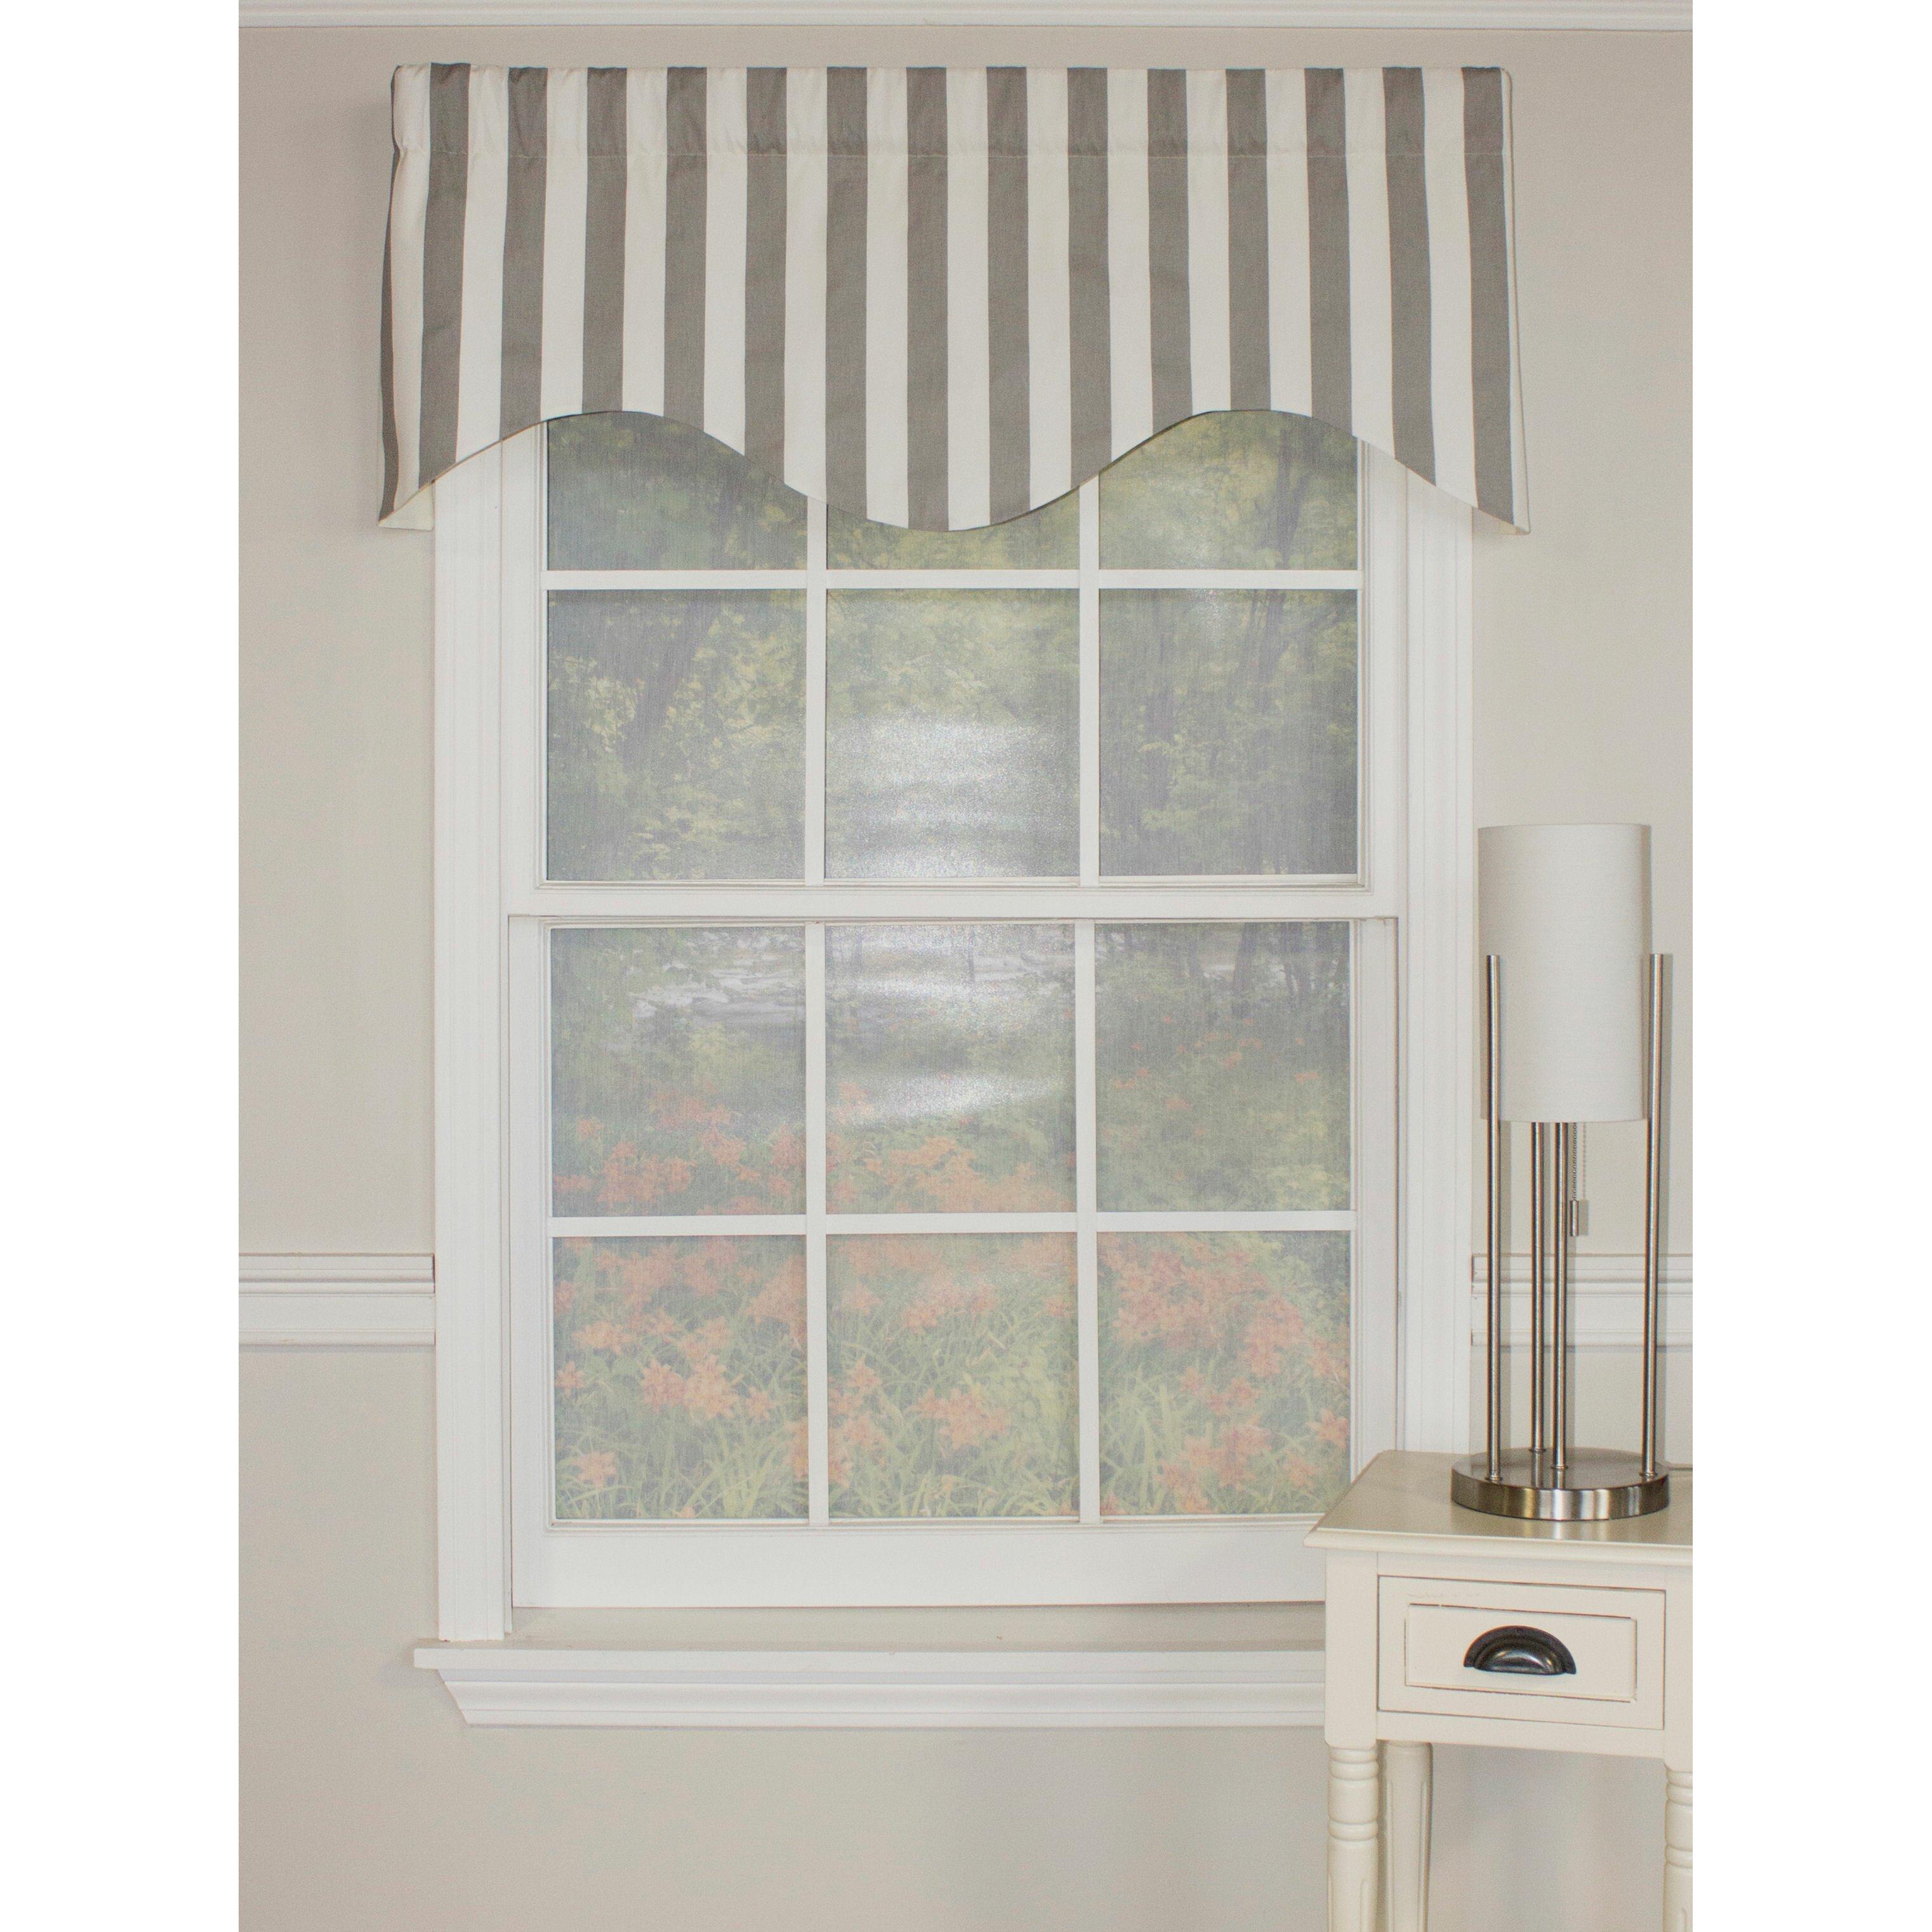 Rlf Home Awning Stripe Cornice 50 Curtain Valance